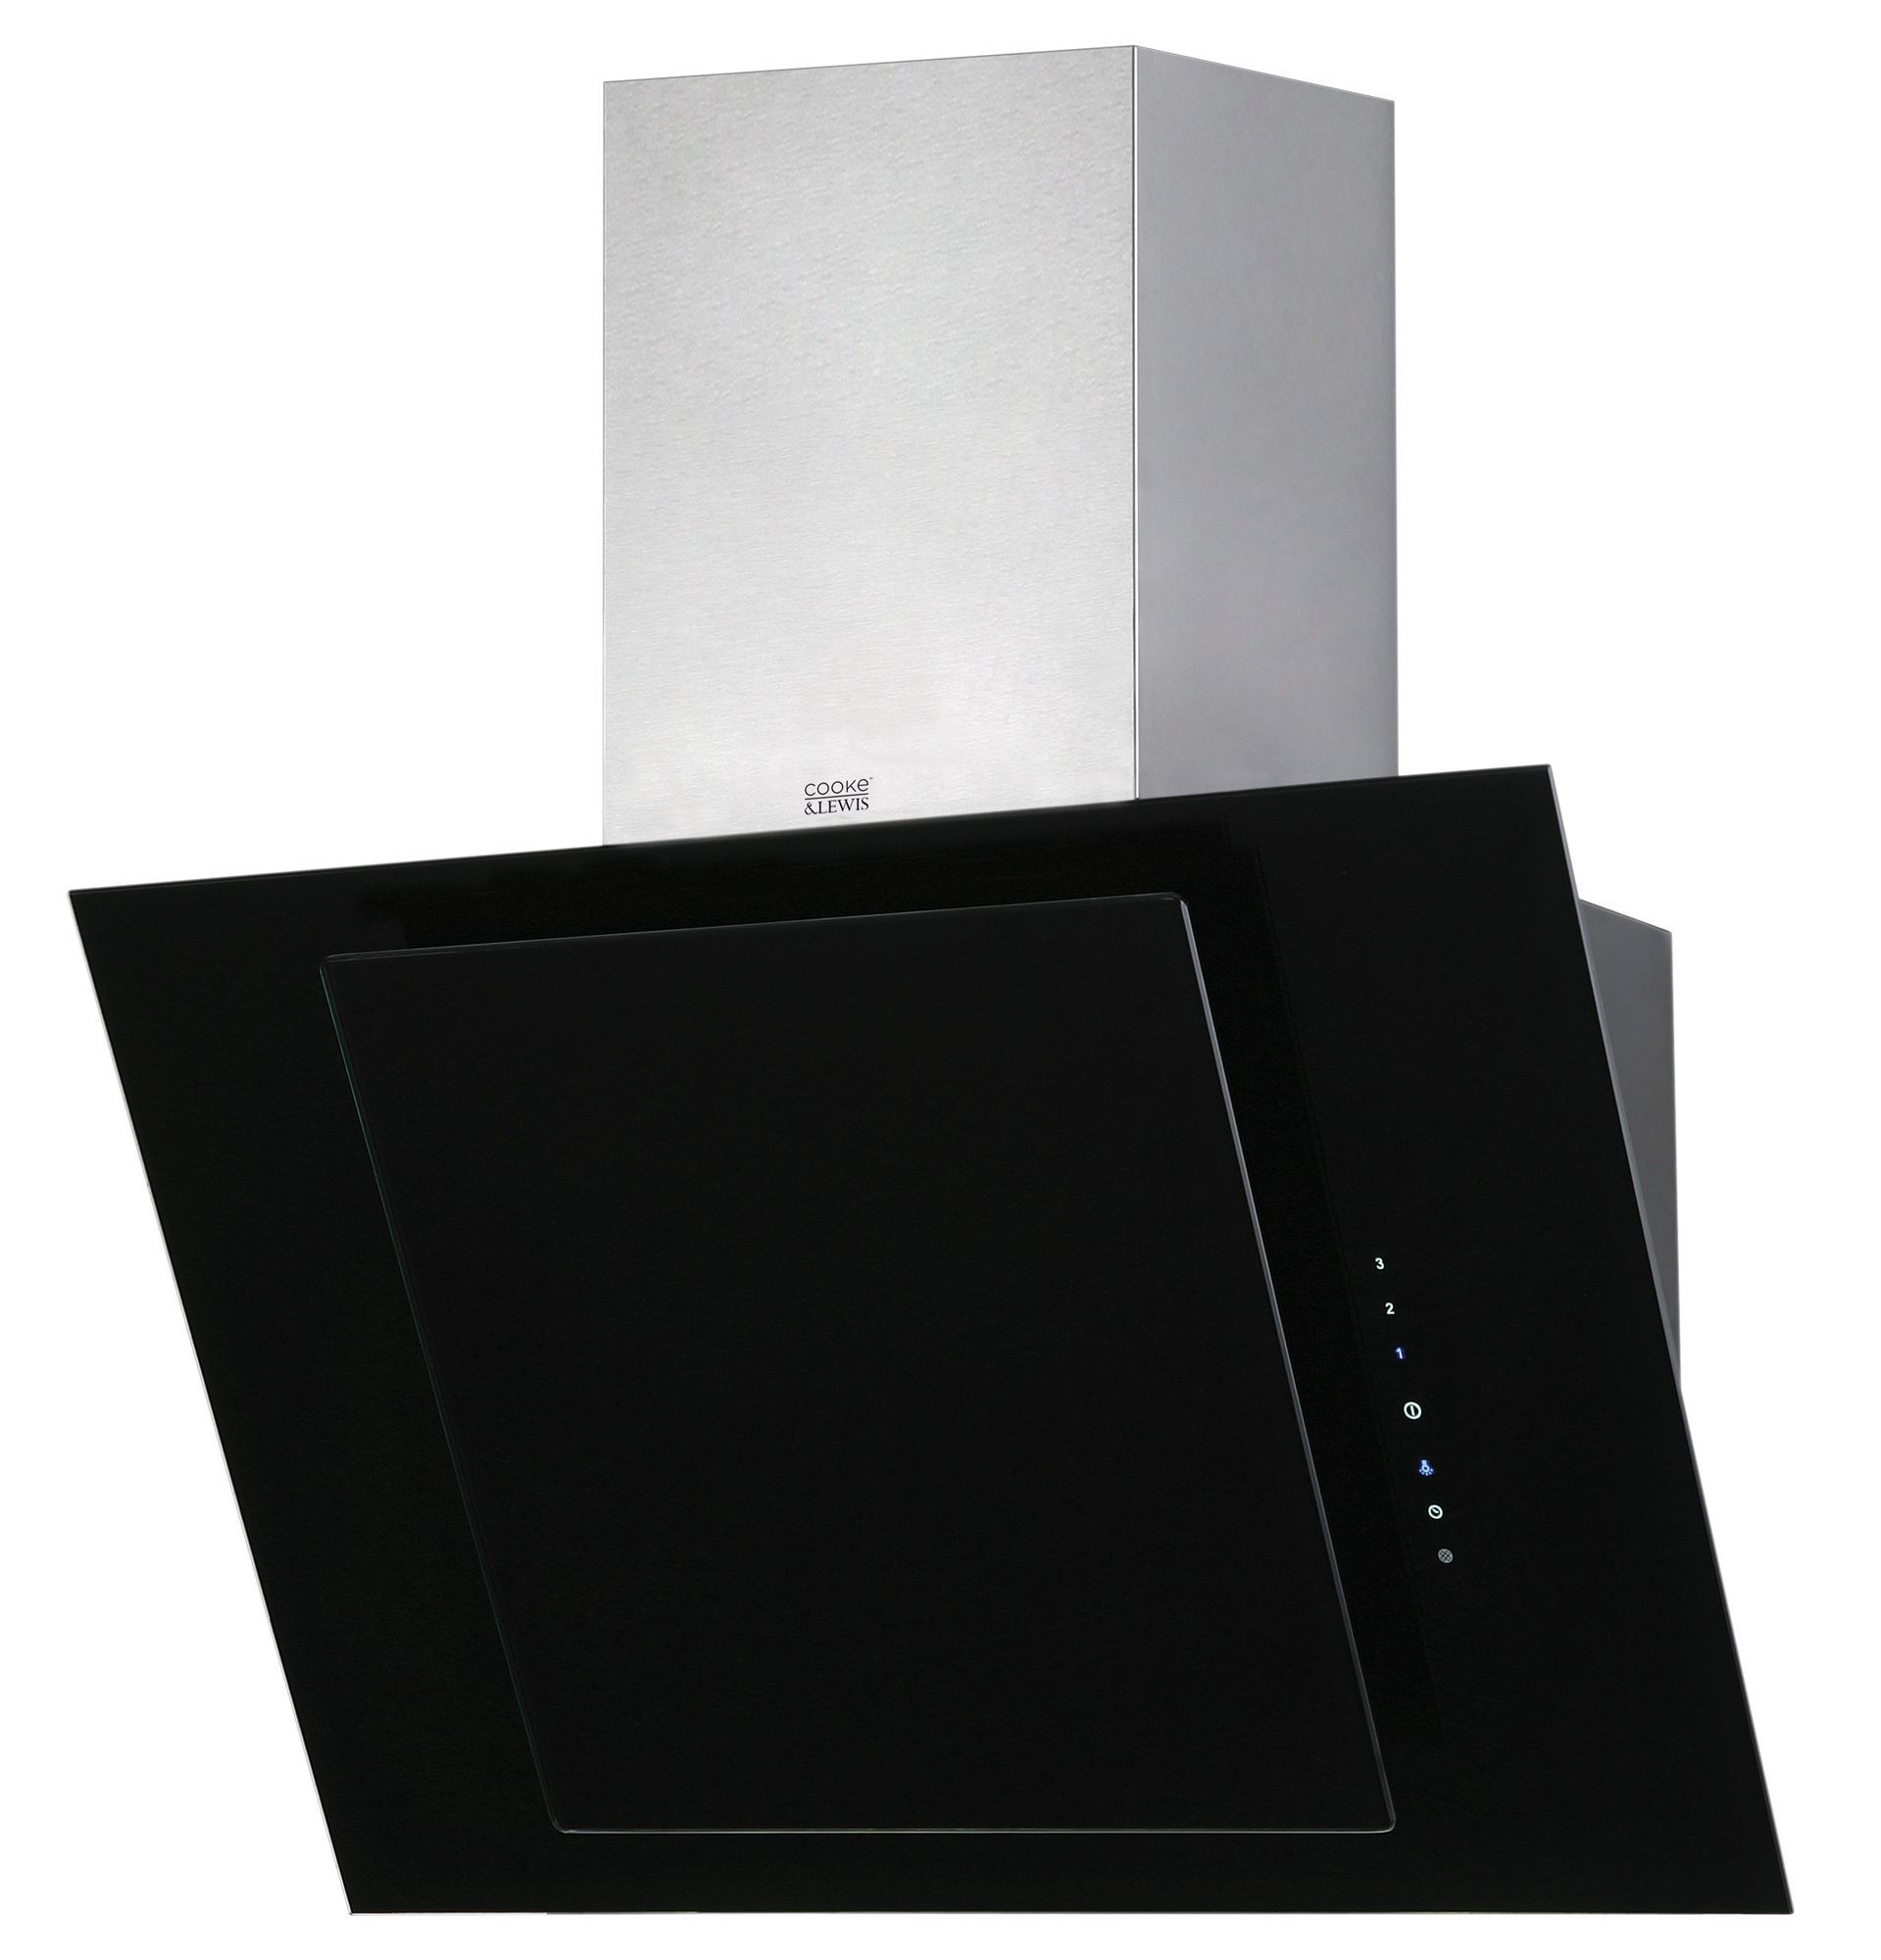 cooke lewis clthal60 c black stainless steel angled. Black Bedroom Furniture Sets. Home Design Ideas